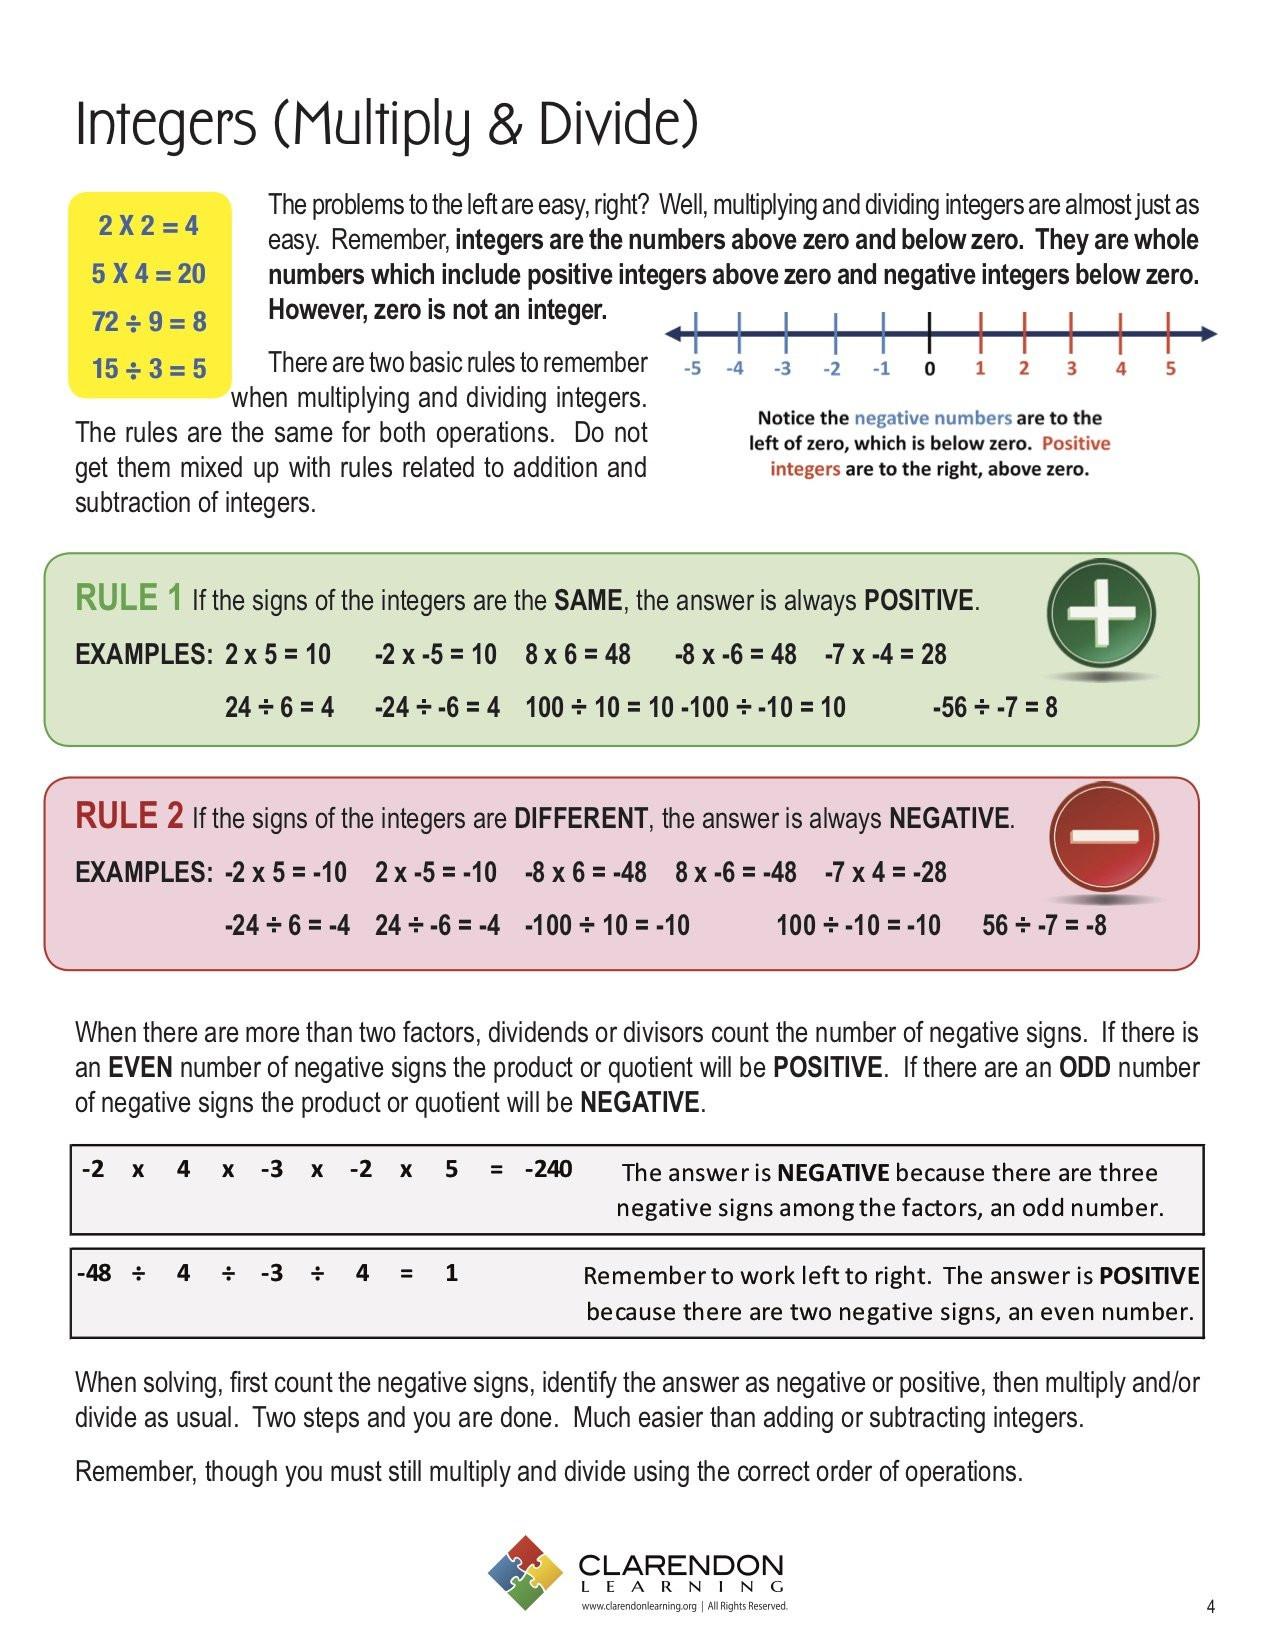 Multiply and Divide Integers Worksheet